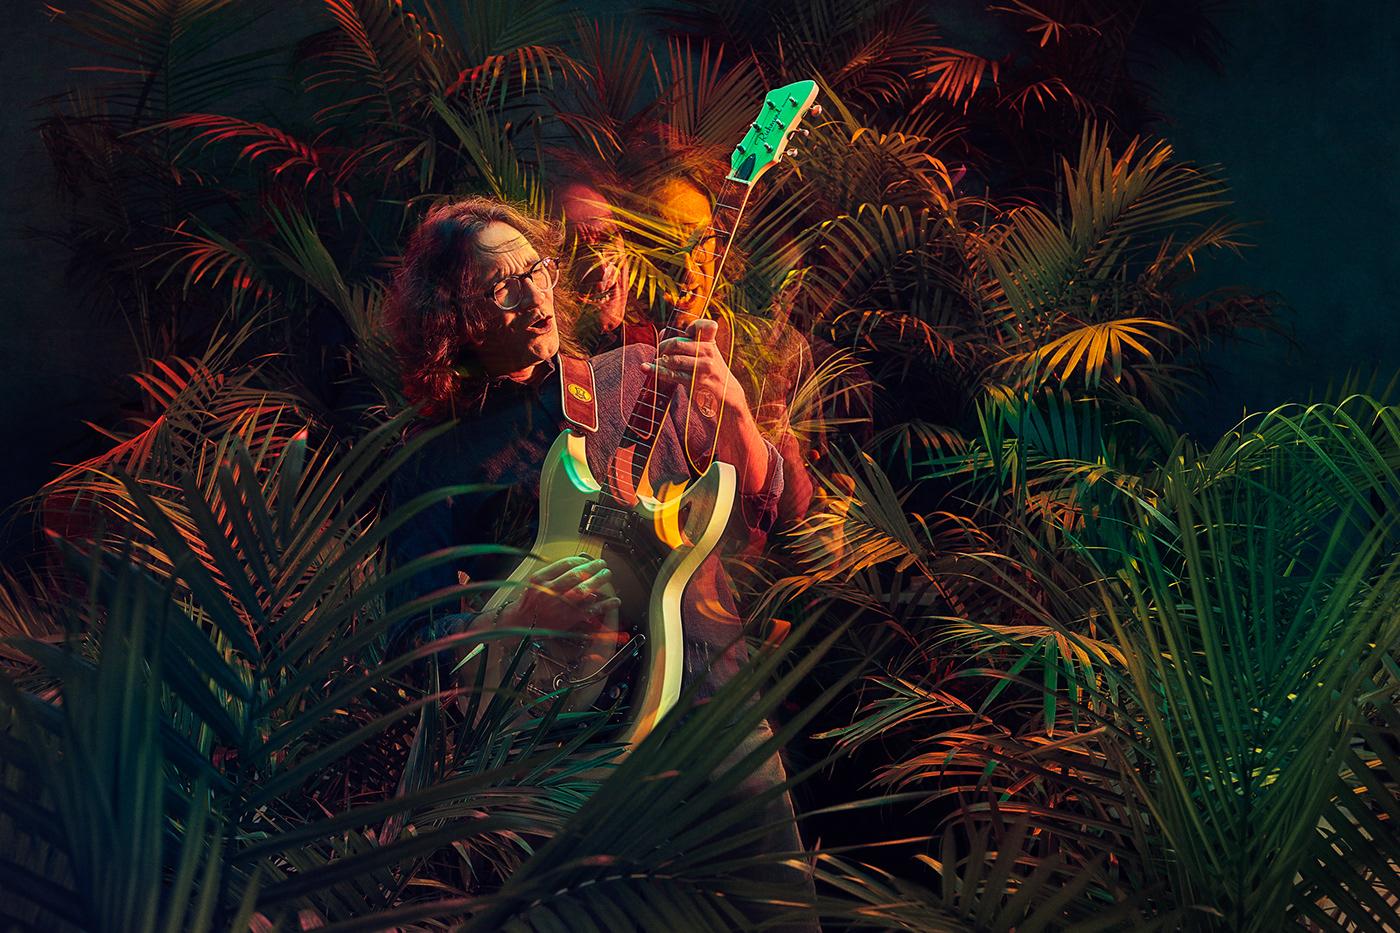 music cover Album afrocolombian rythms guitar Santana Tropical Music music project album cover